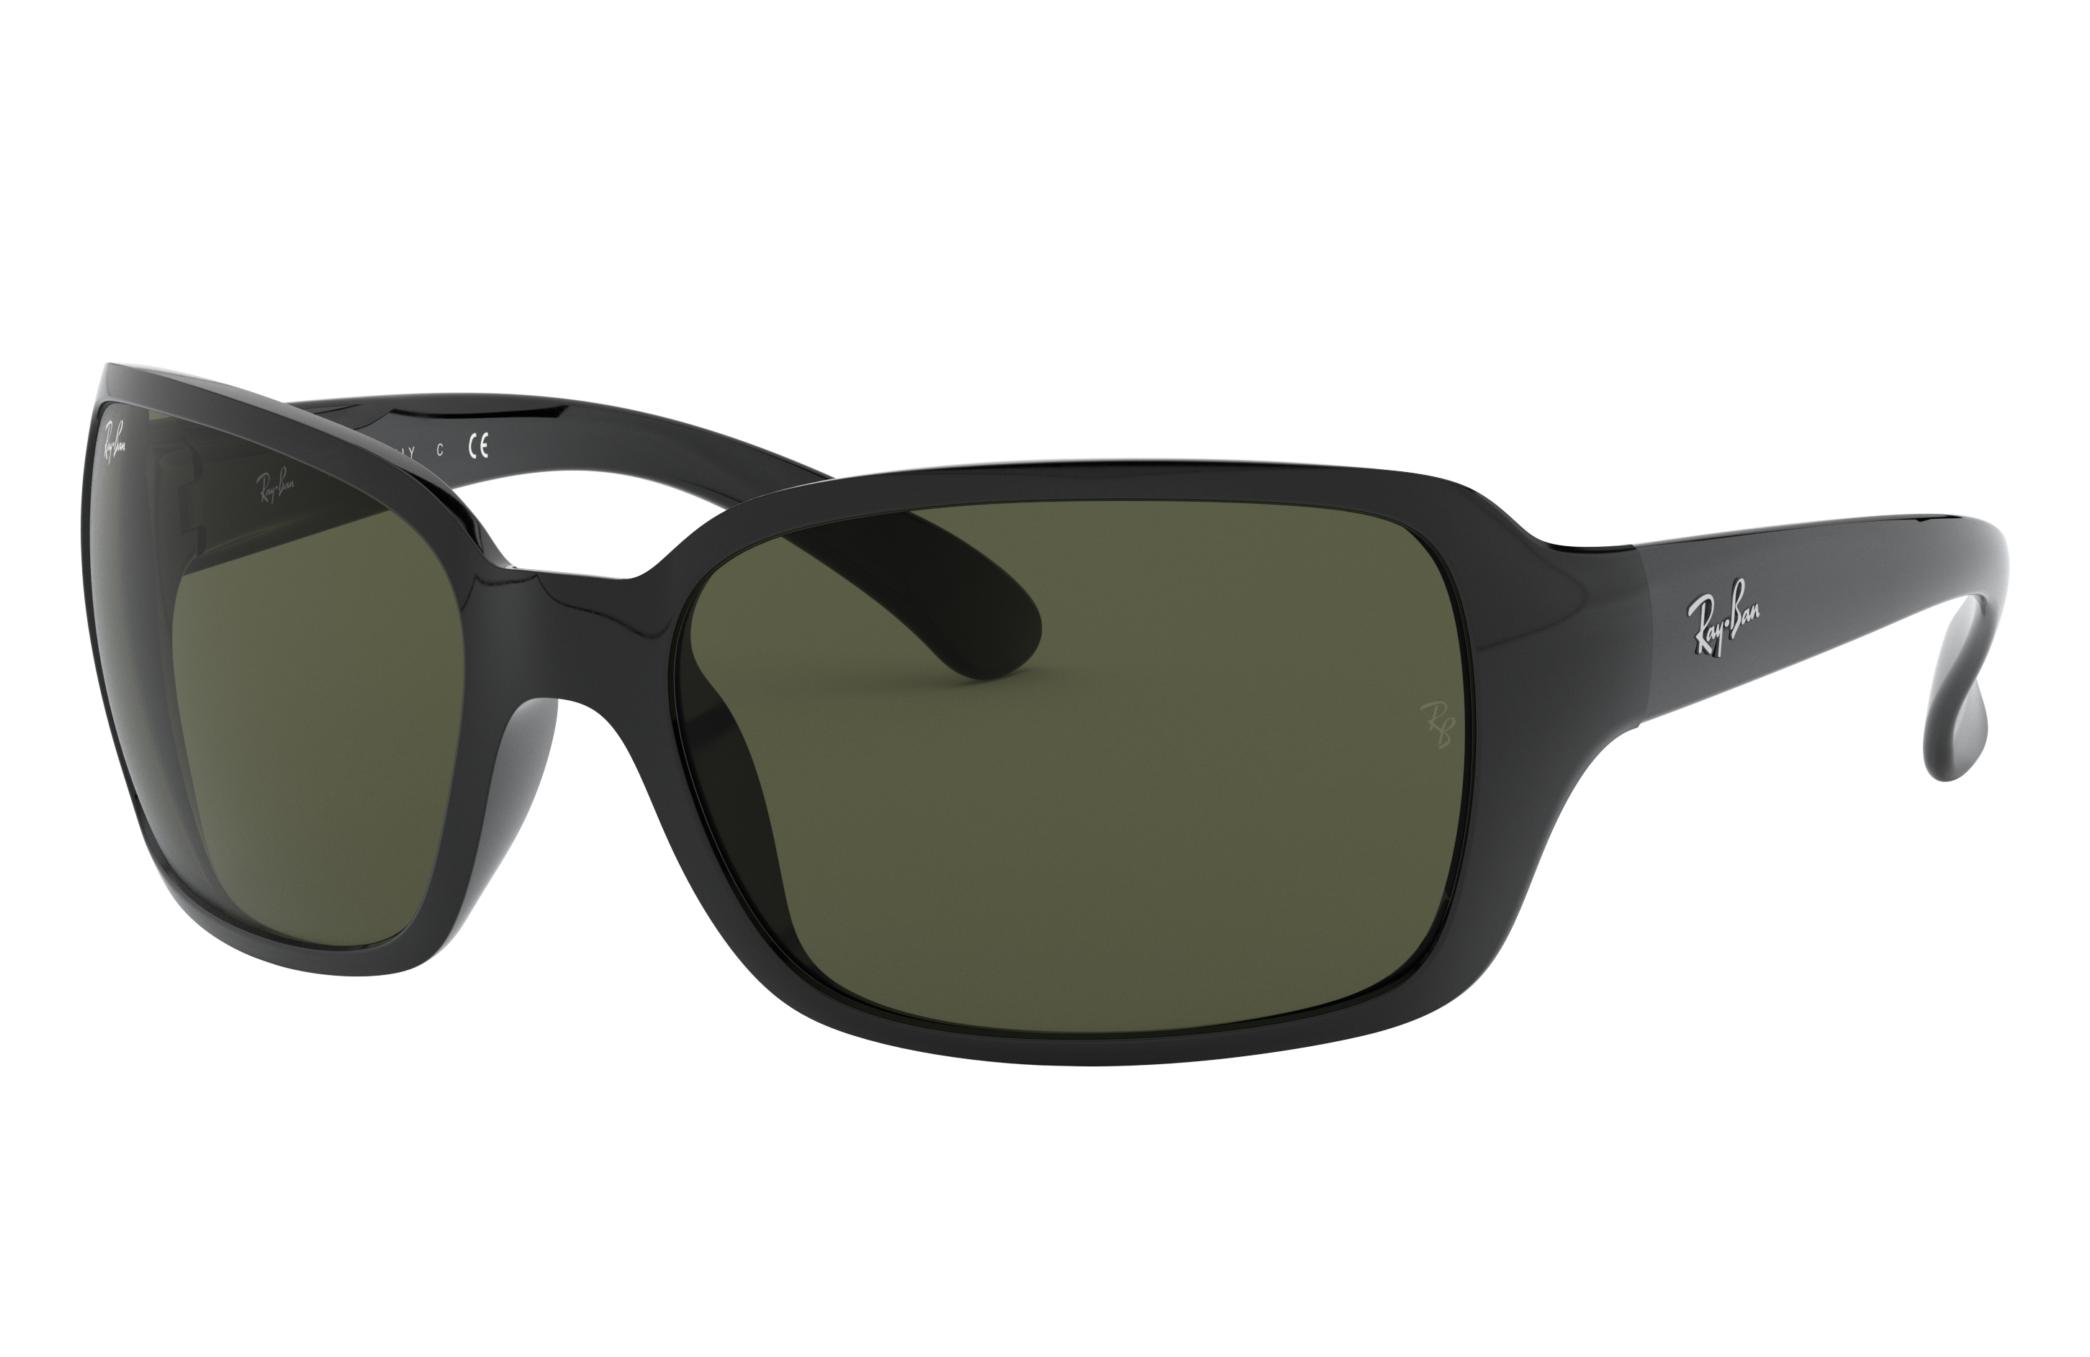 Ray-Ban Rb4068 Black, Green Lenses - RB4068